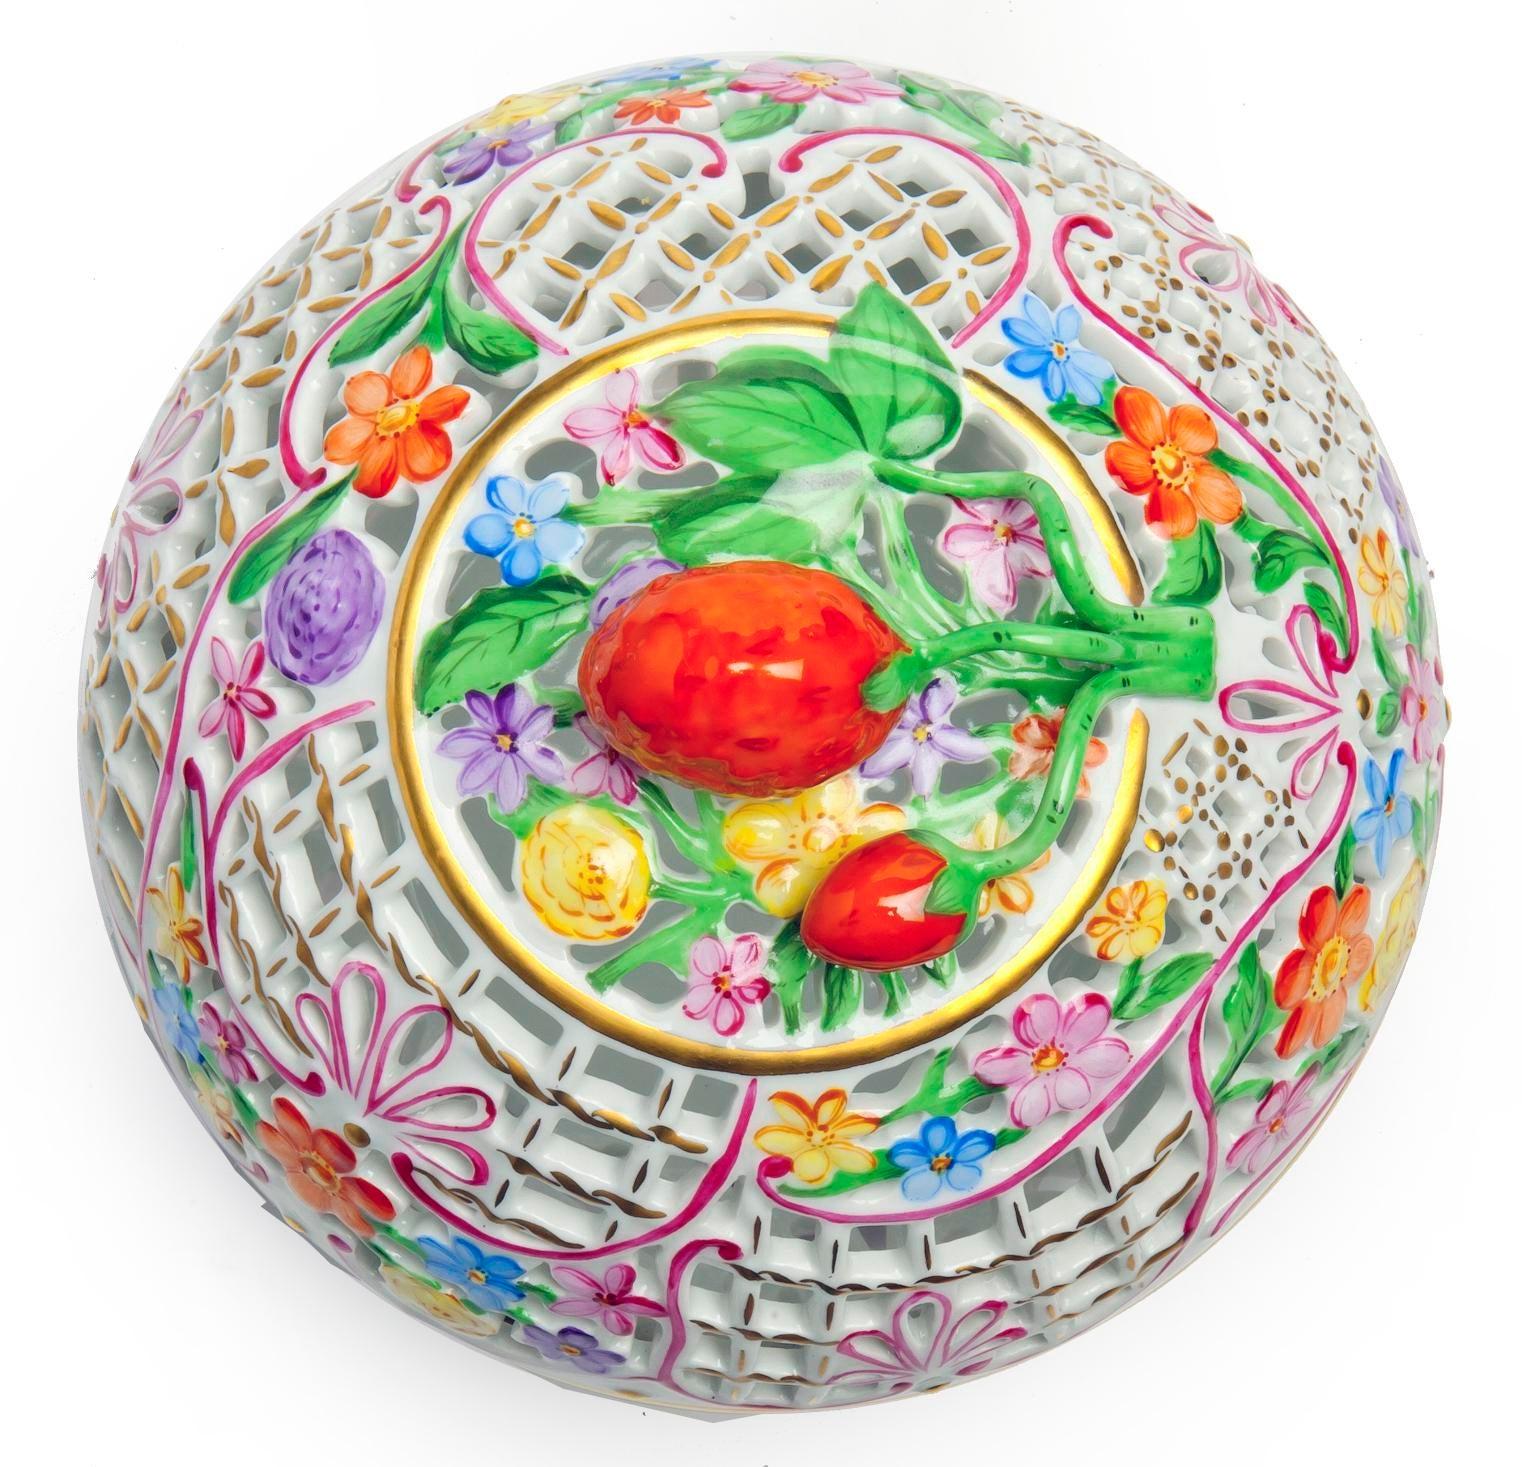 Herend Strawberry Finial Medium Openwork Ball